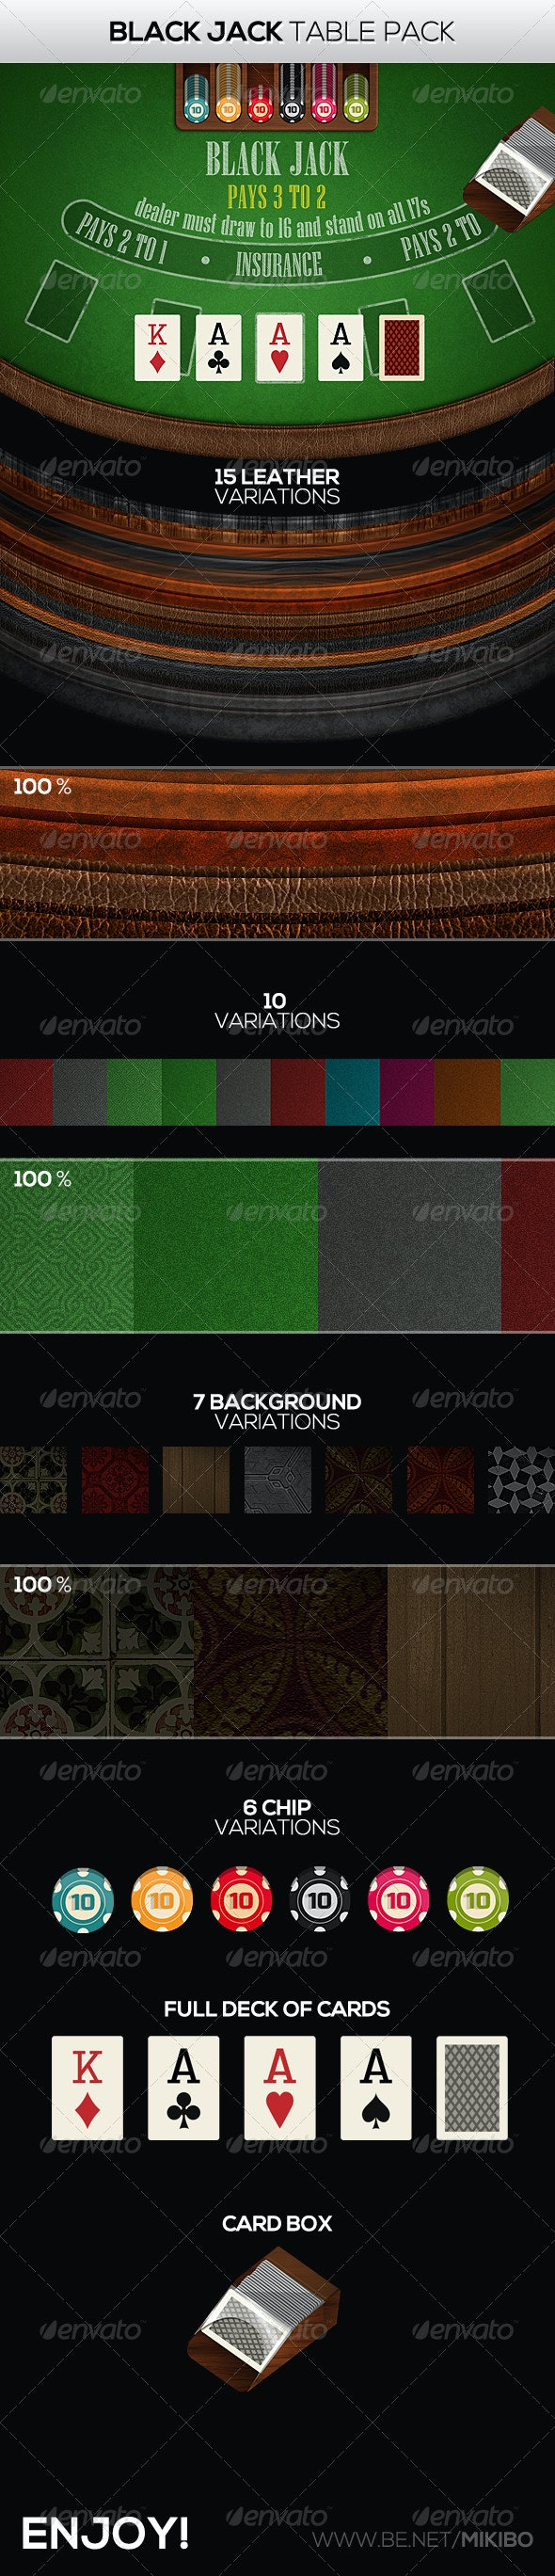 Black Jack Table Pack - Game Kits Game Assets